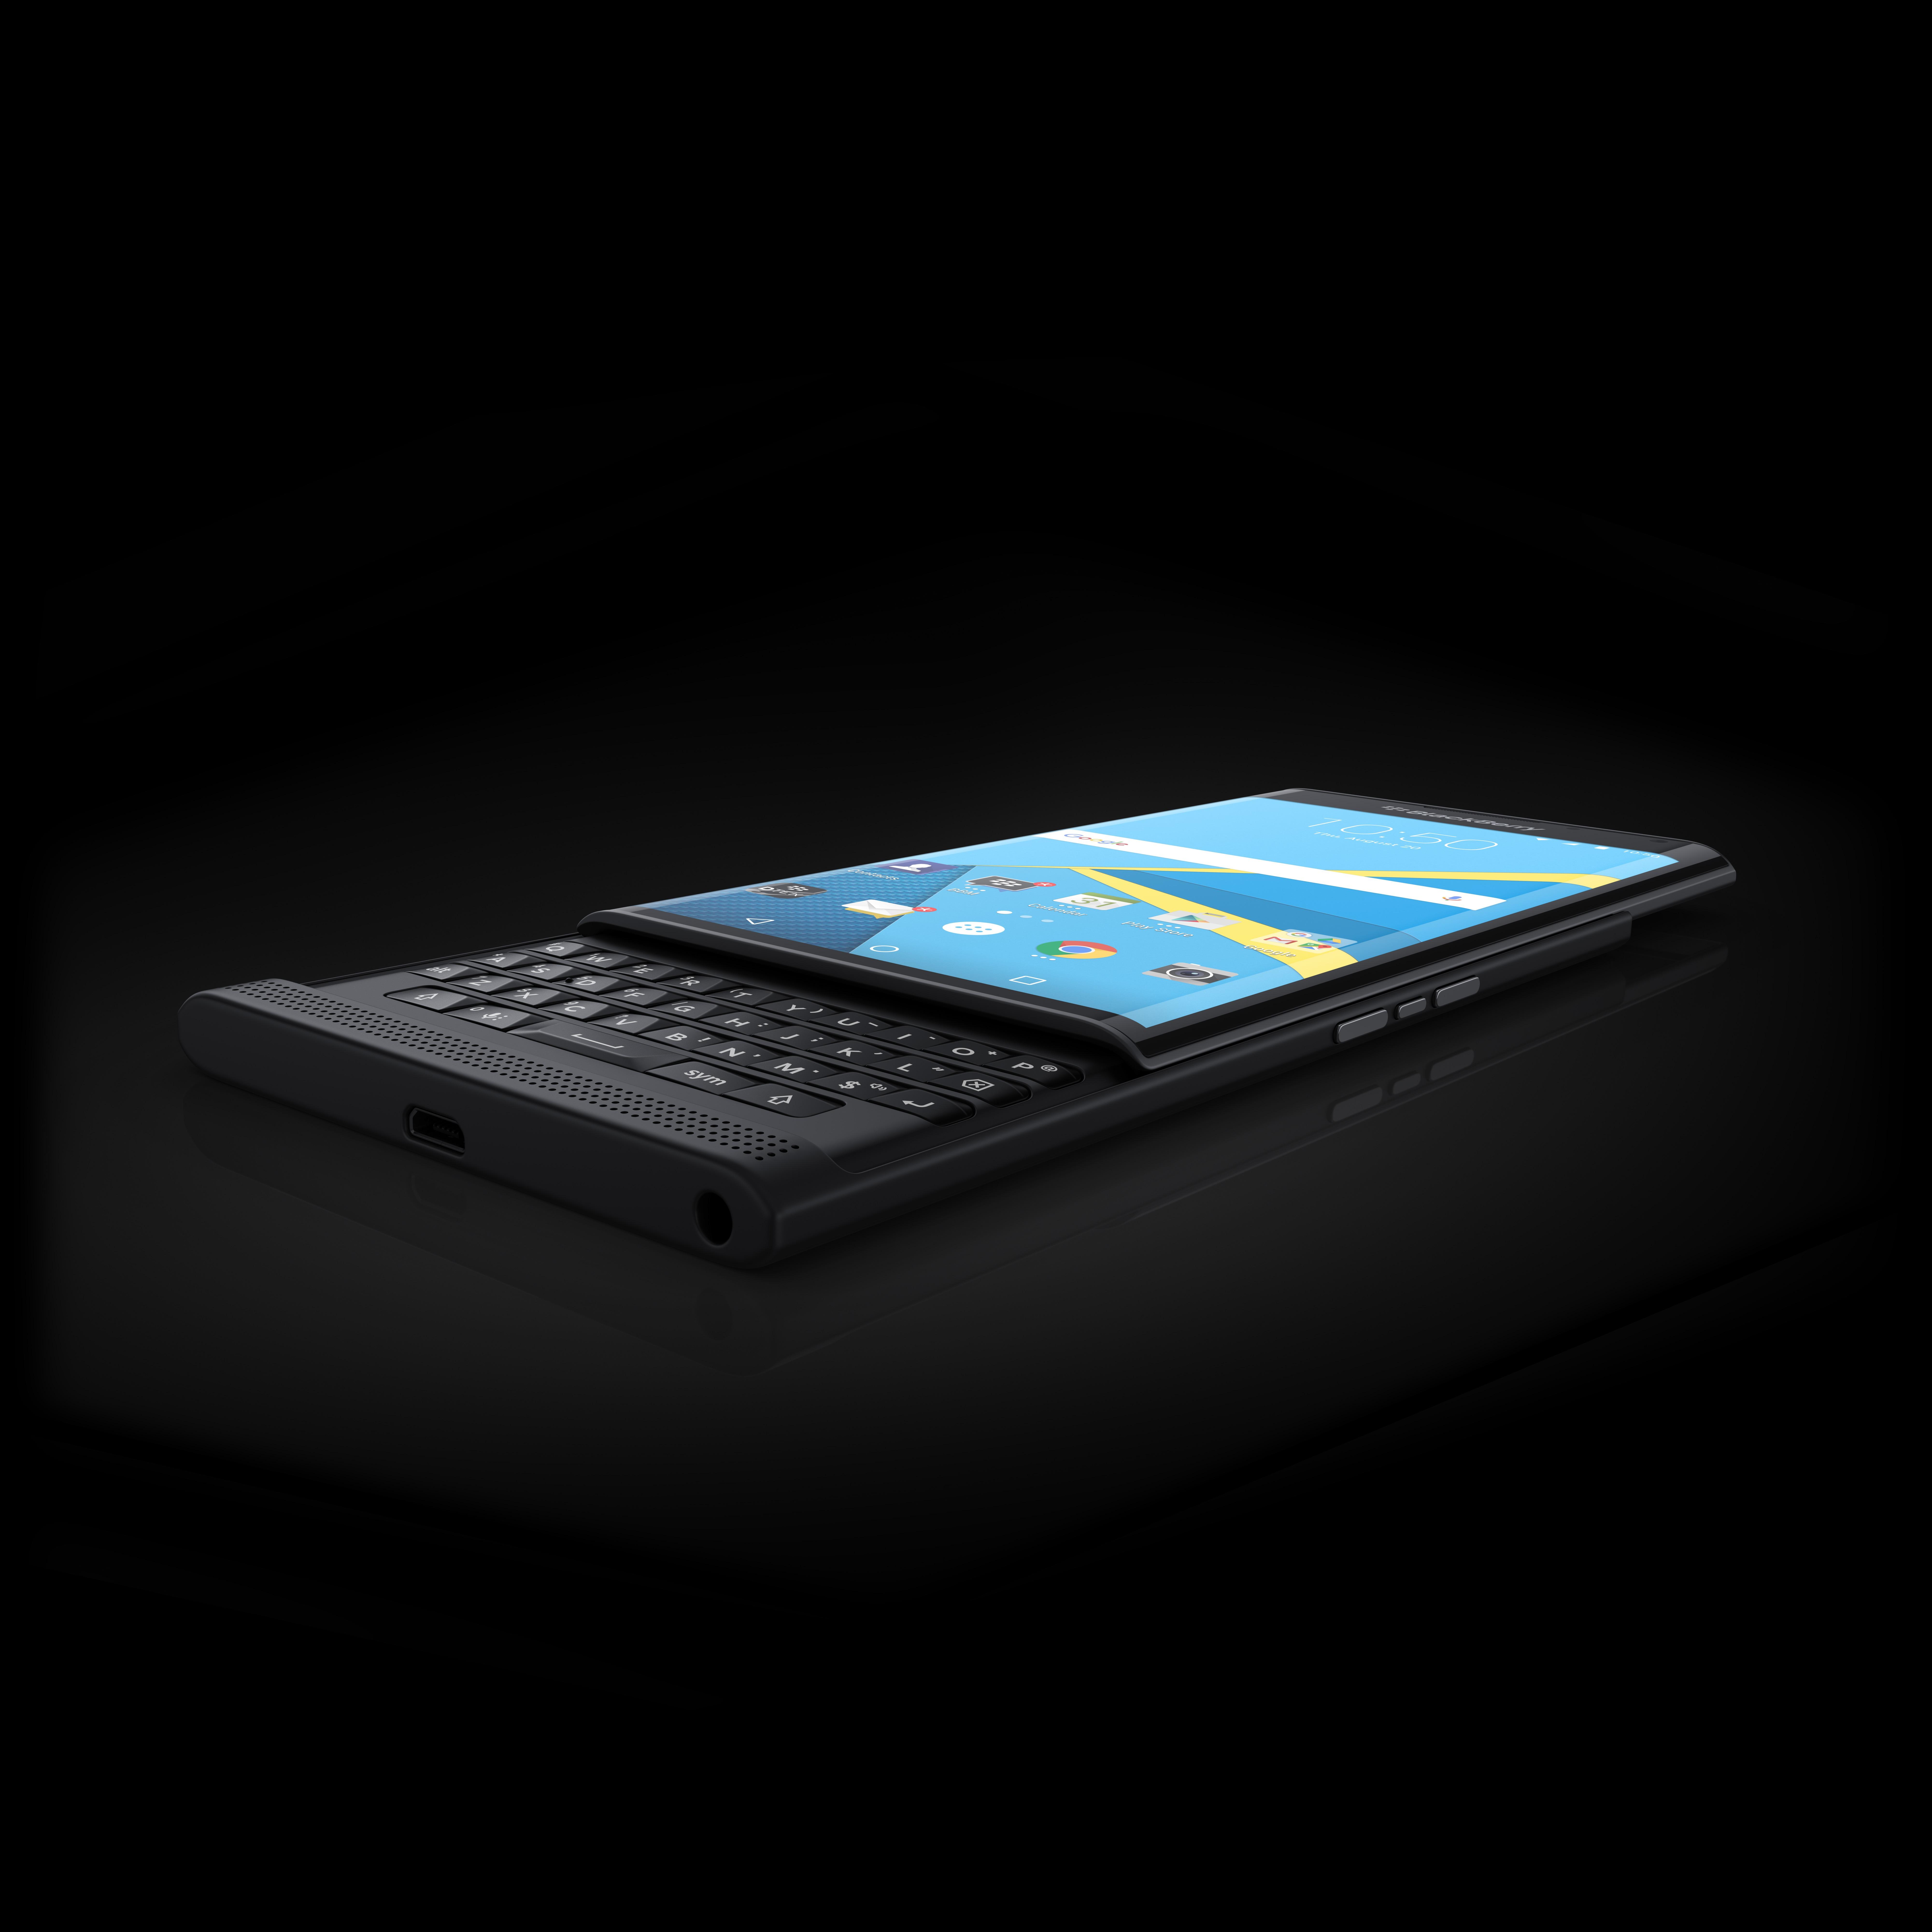 The Blackberry Priv runs Google's mobile operating system.